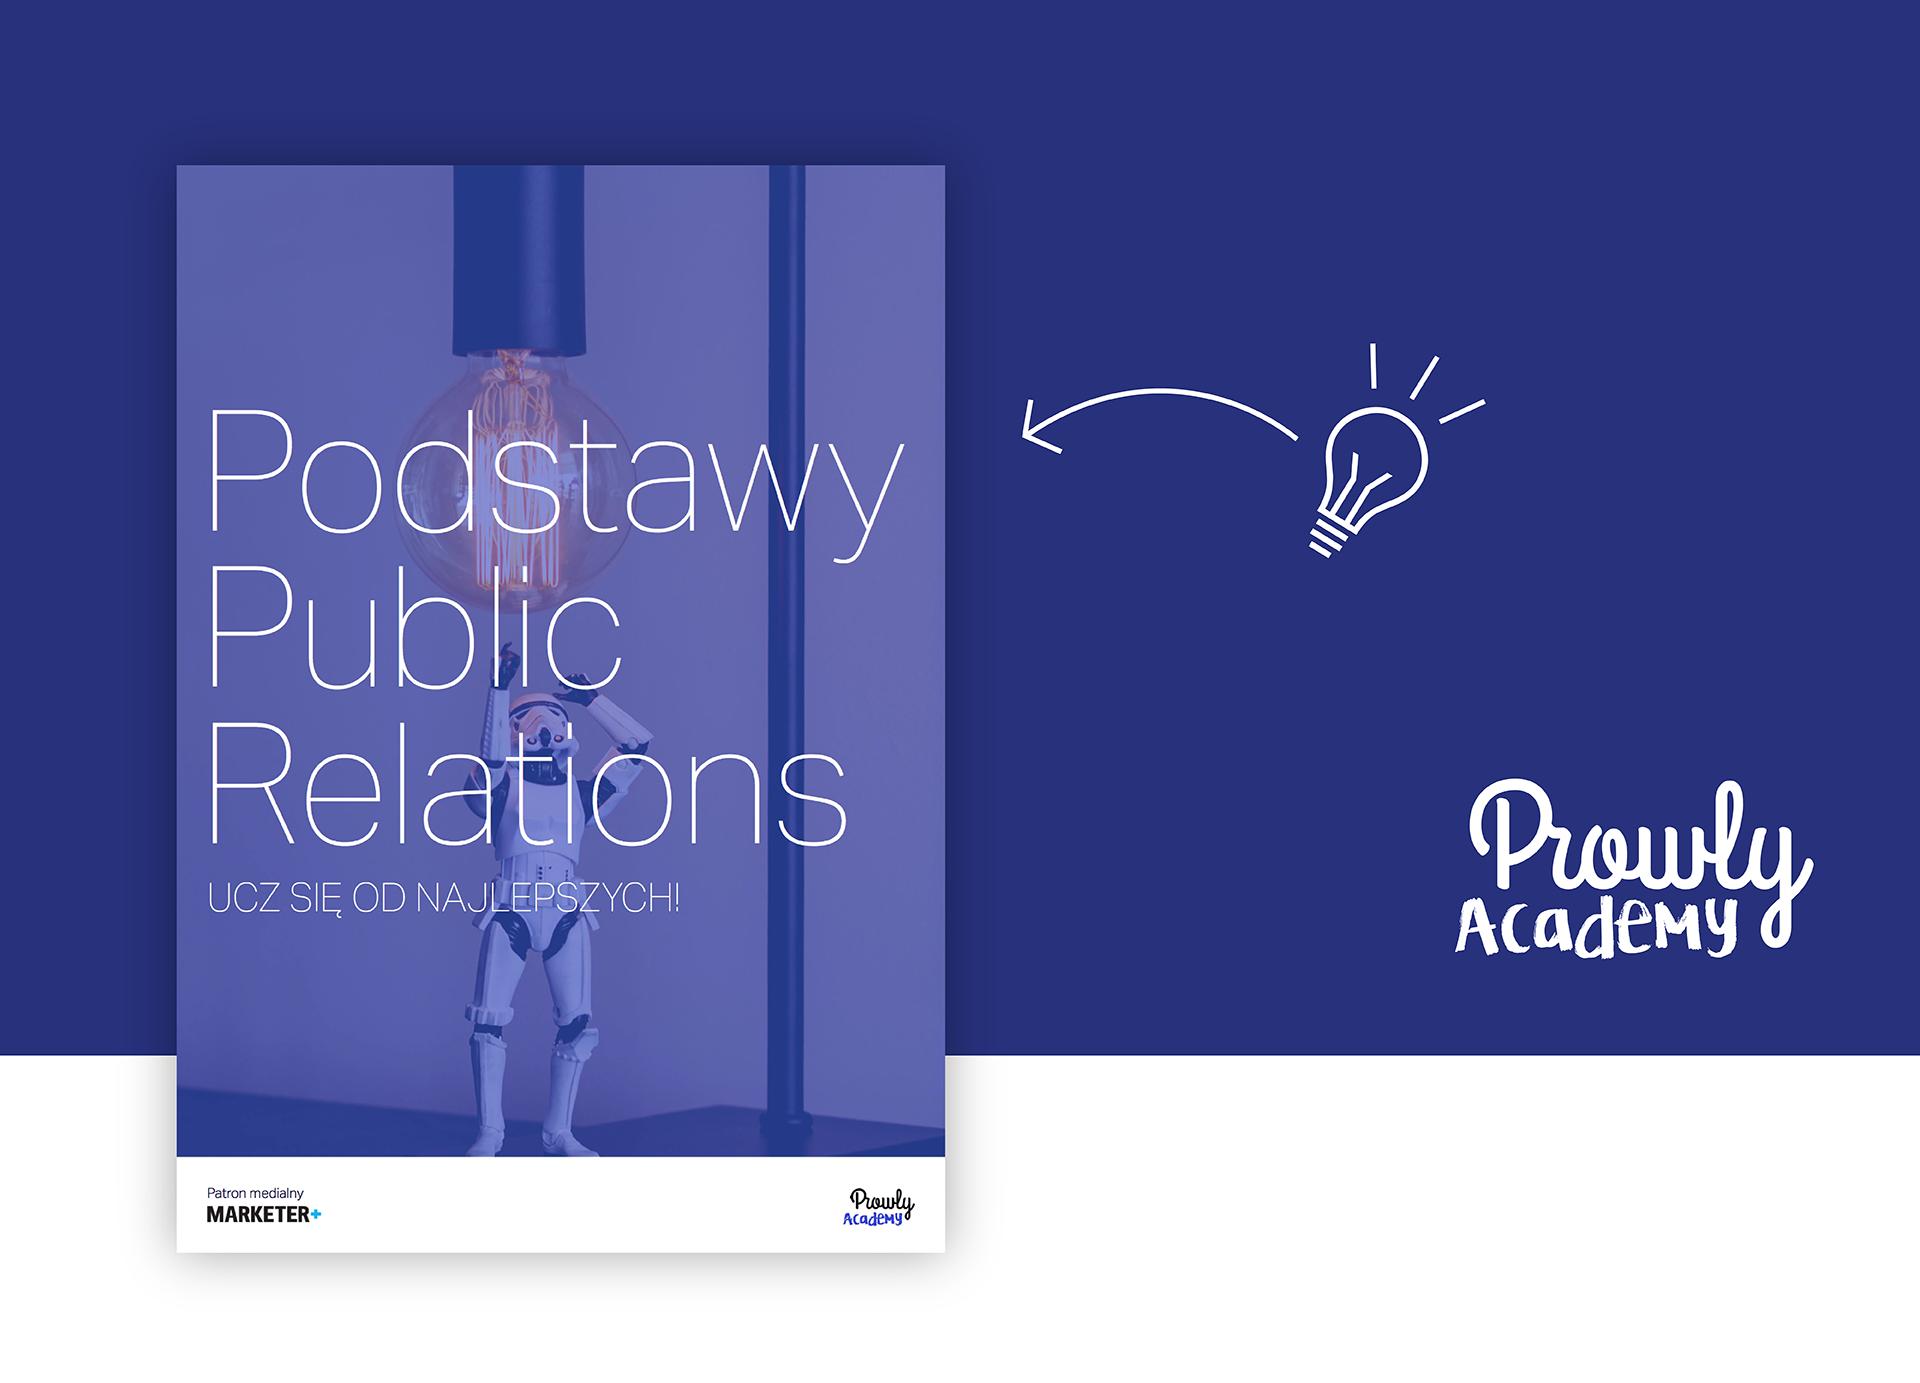 Podstawy Public Relations Ebook